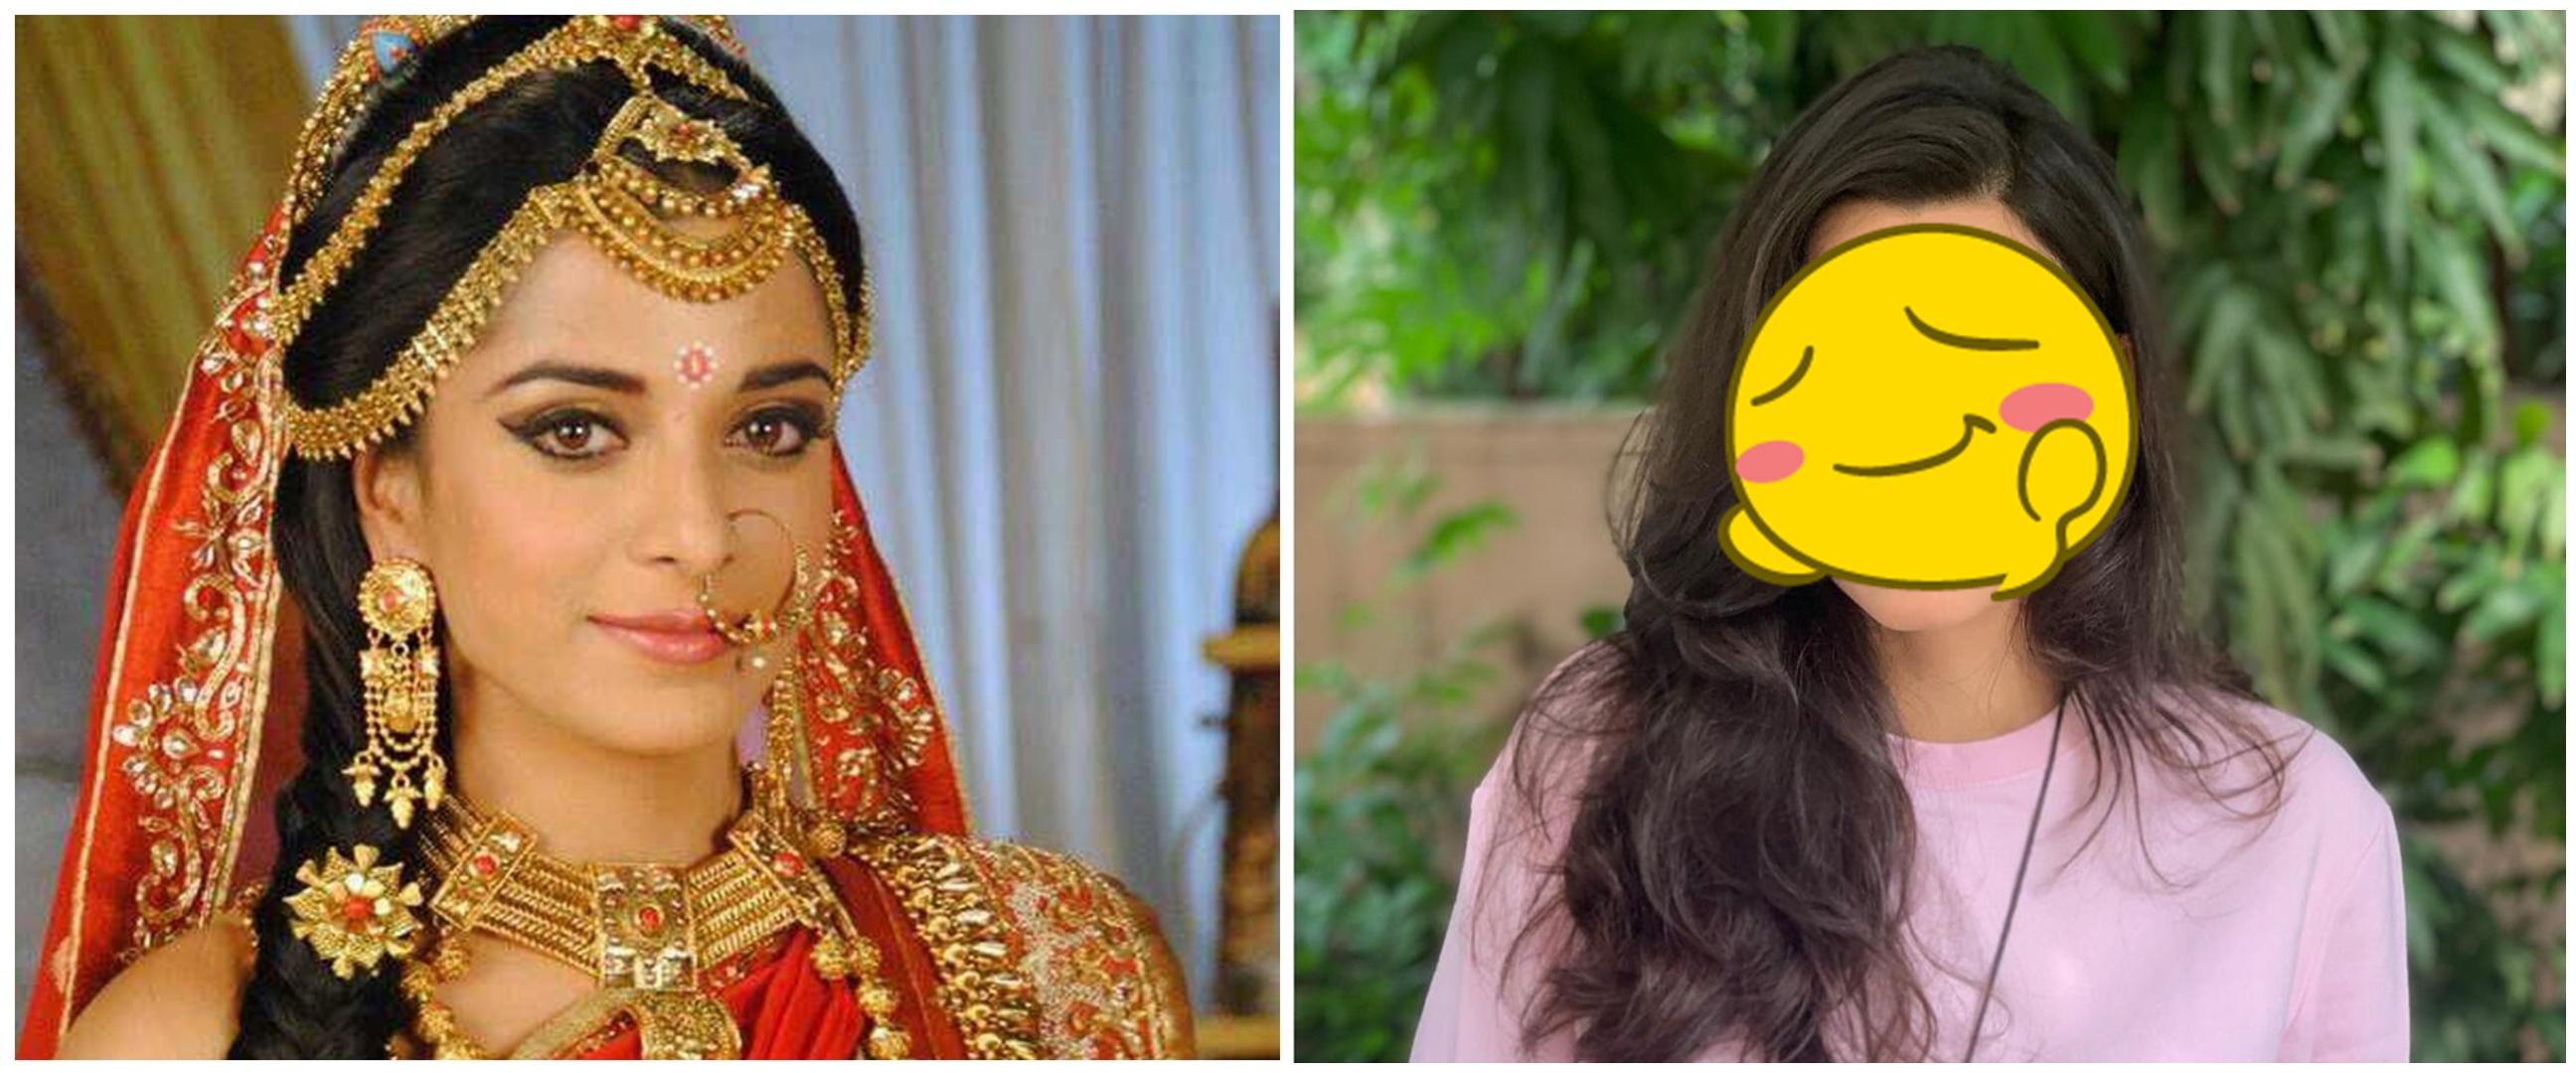 Potret dulu dan kini 10 artis cantik drama kolosal India, beda banget